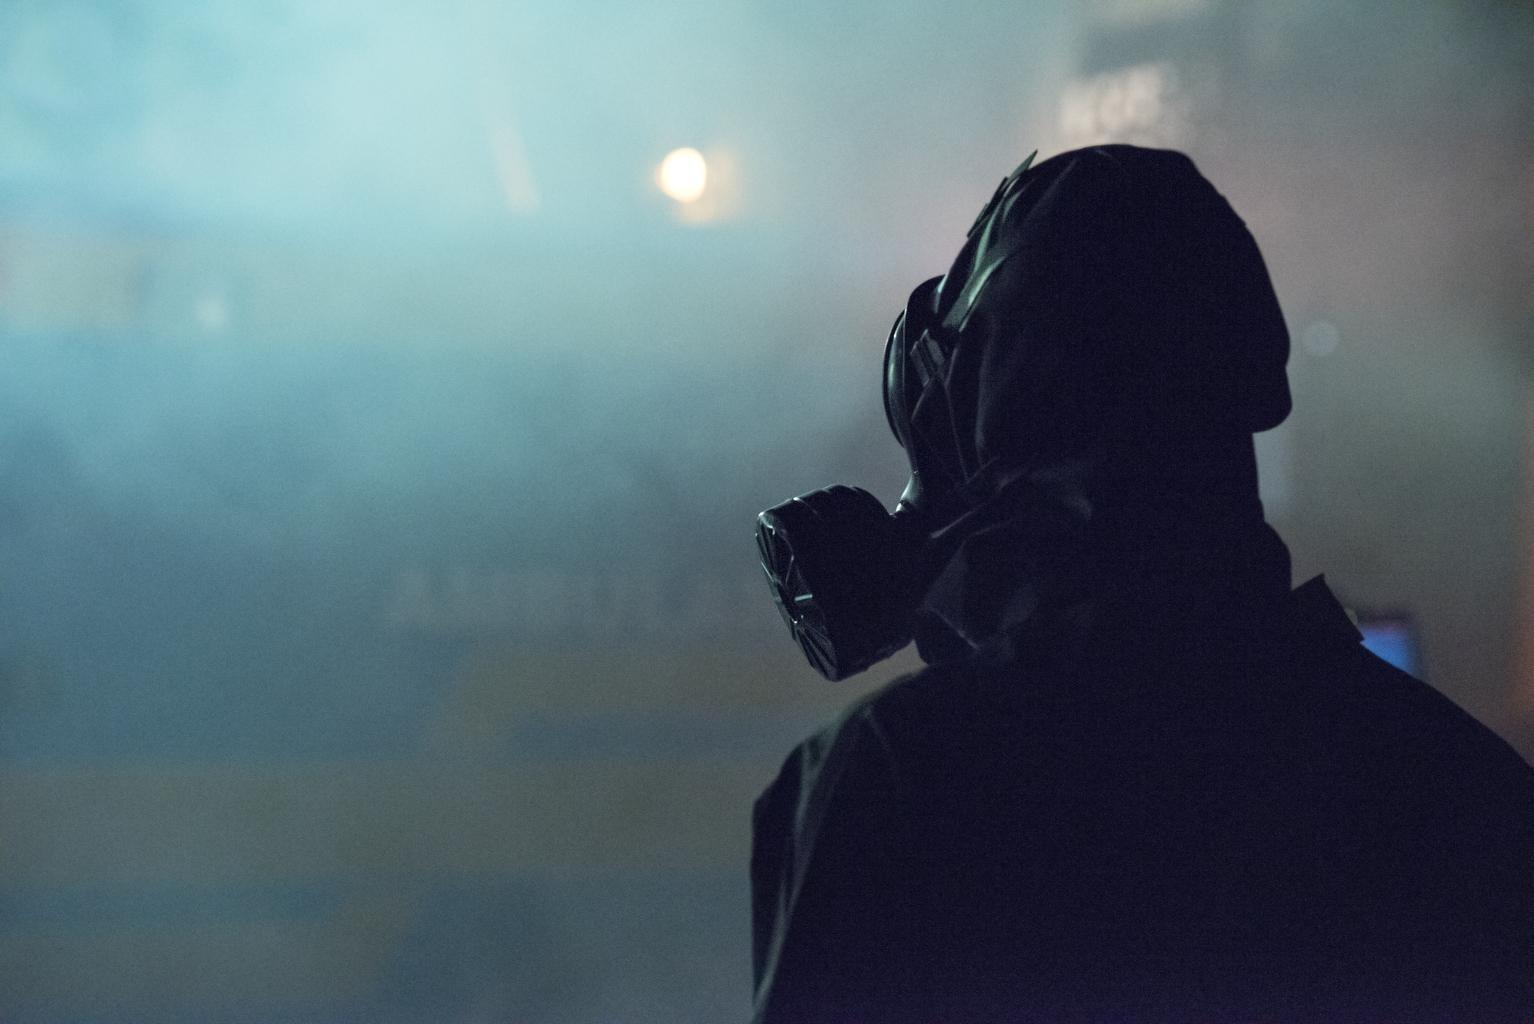 Freakish: Trespass | Season 2 | Episode 1